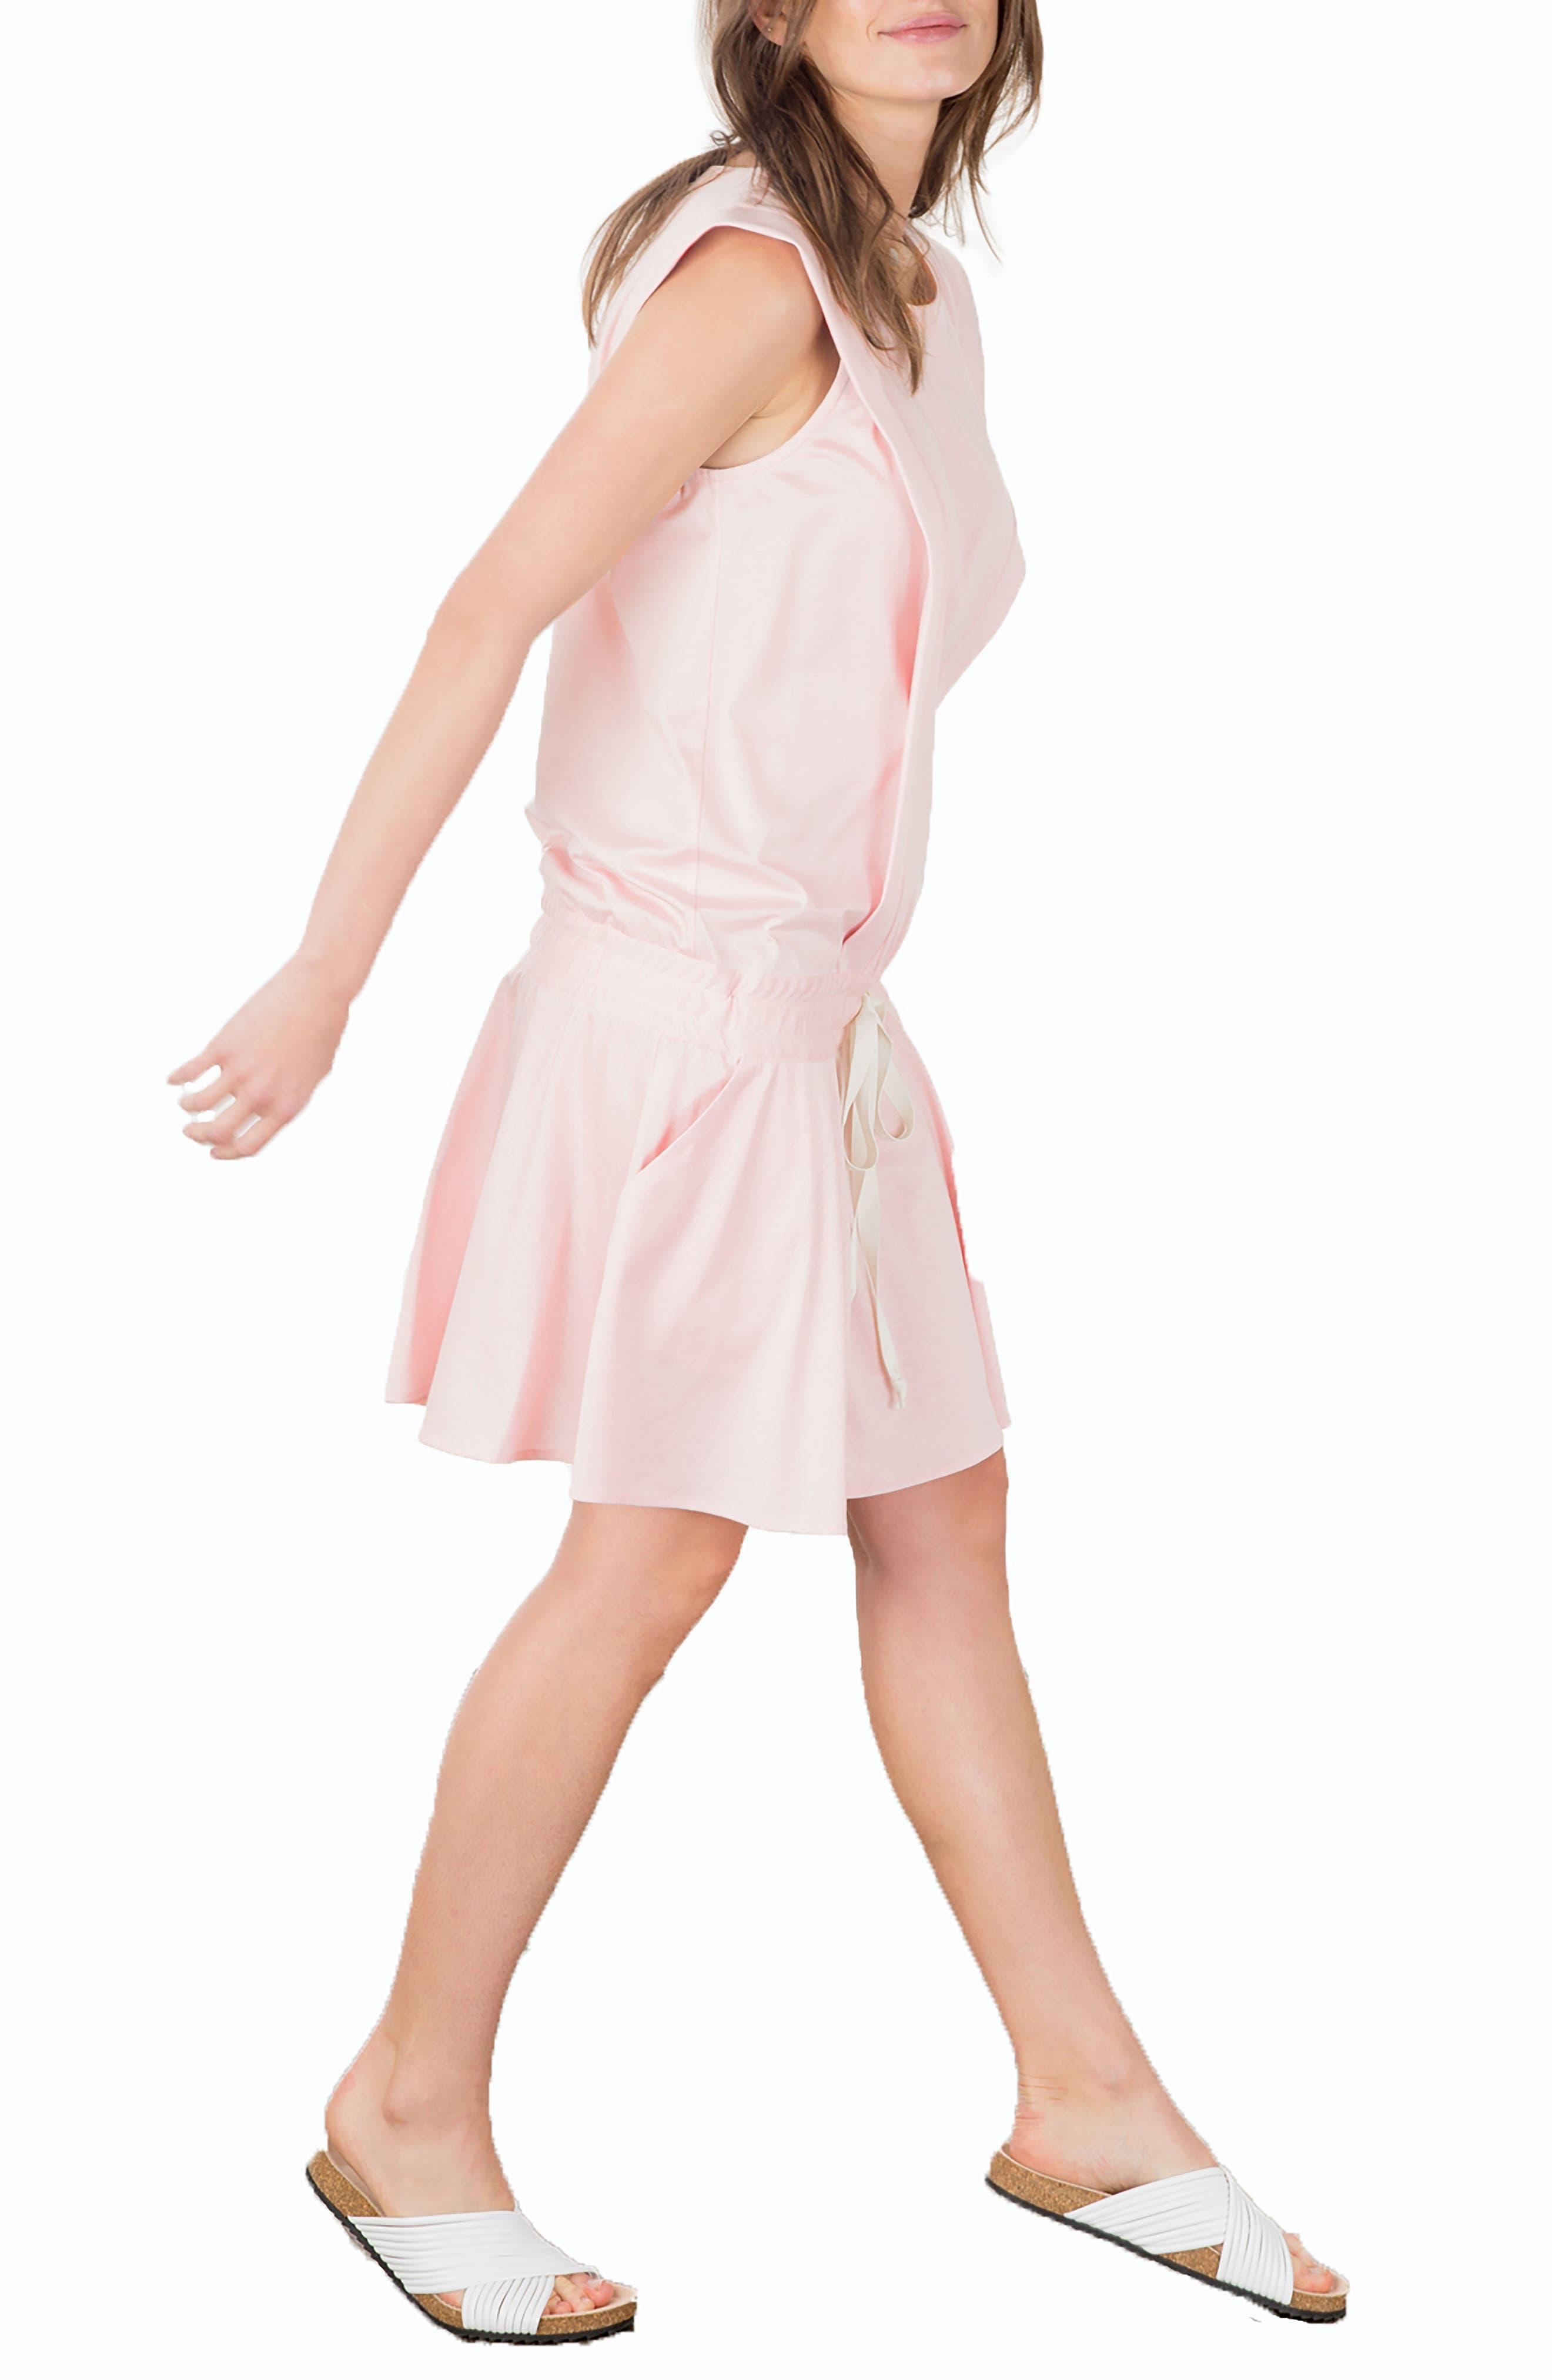 Irene Drop Waist Nursing Dress,                             Alternate thumbnail 2, color,                             650